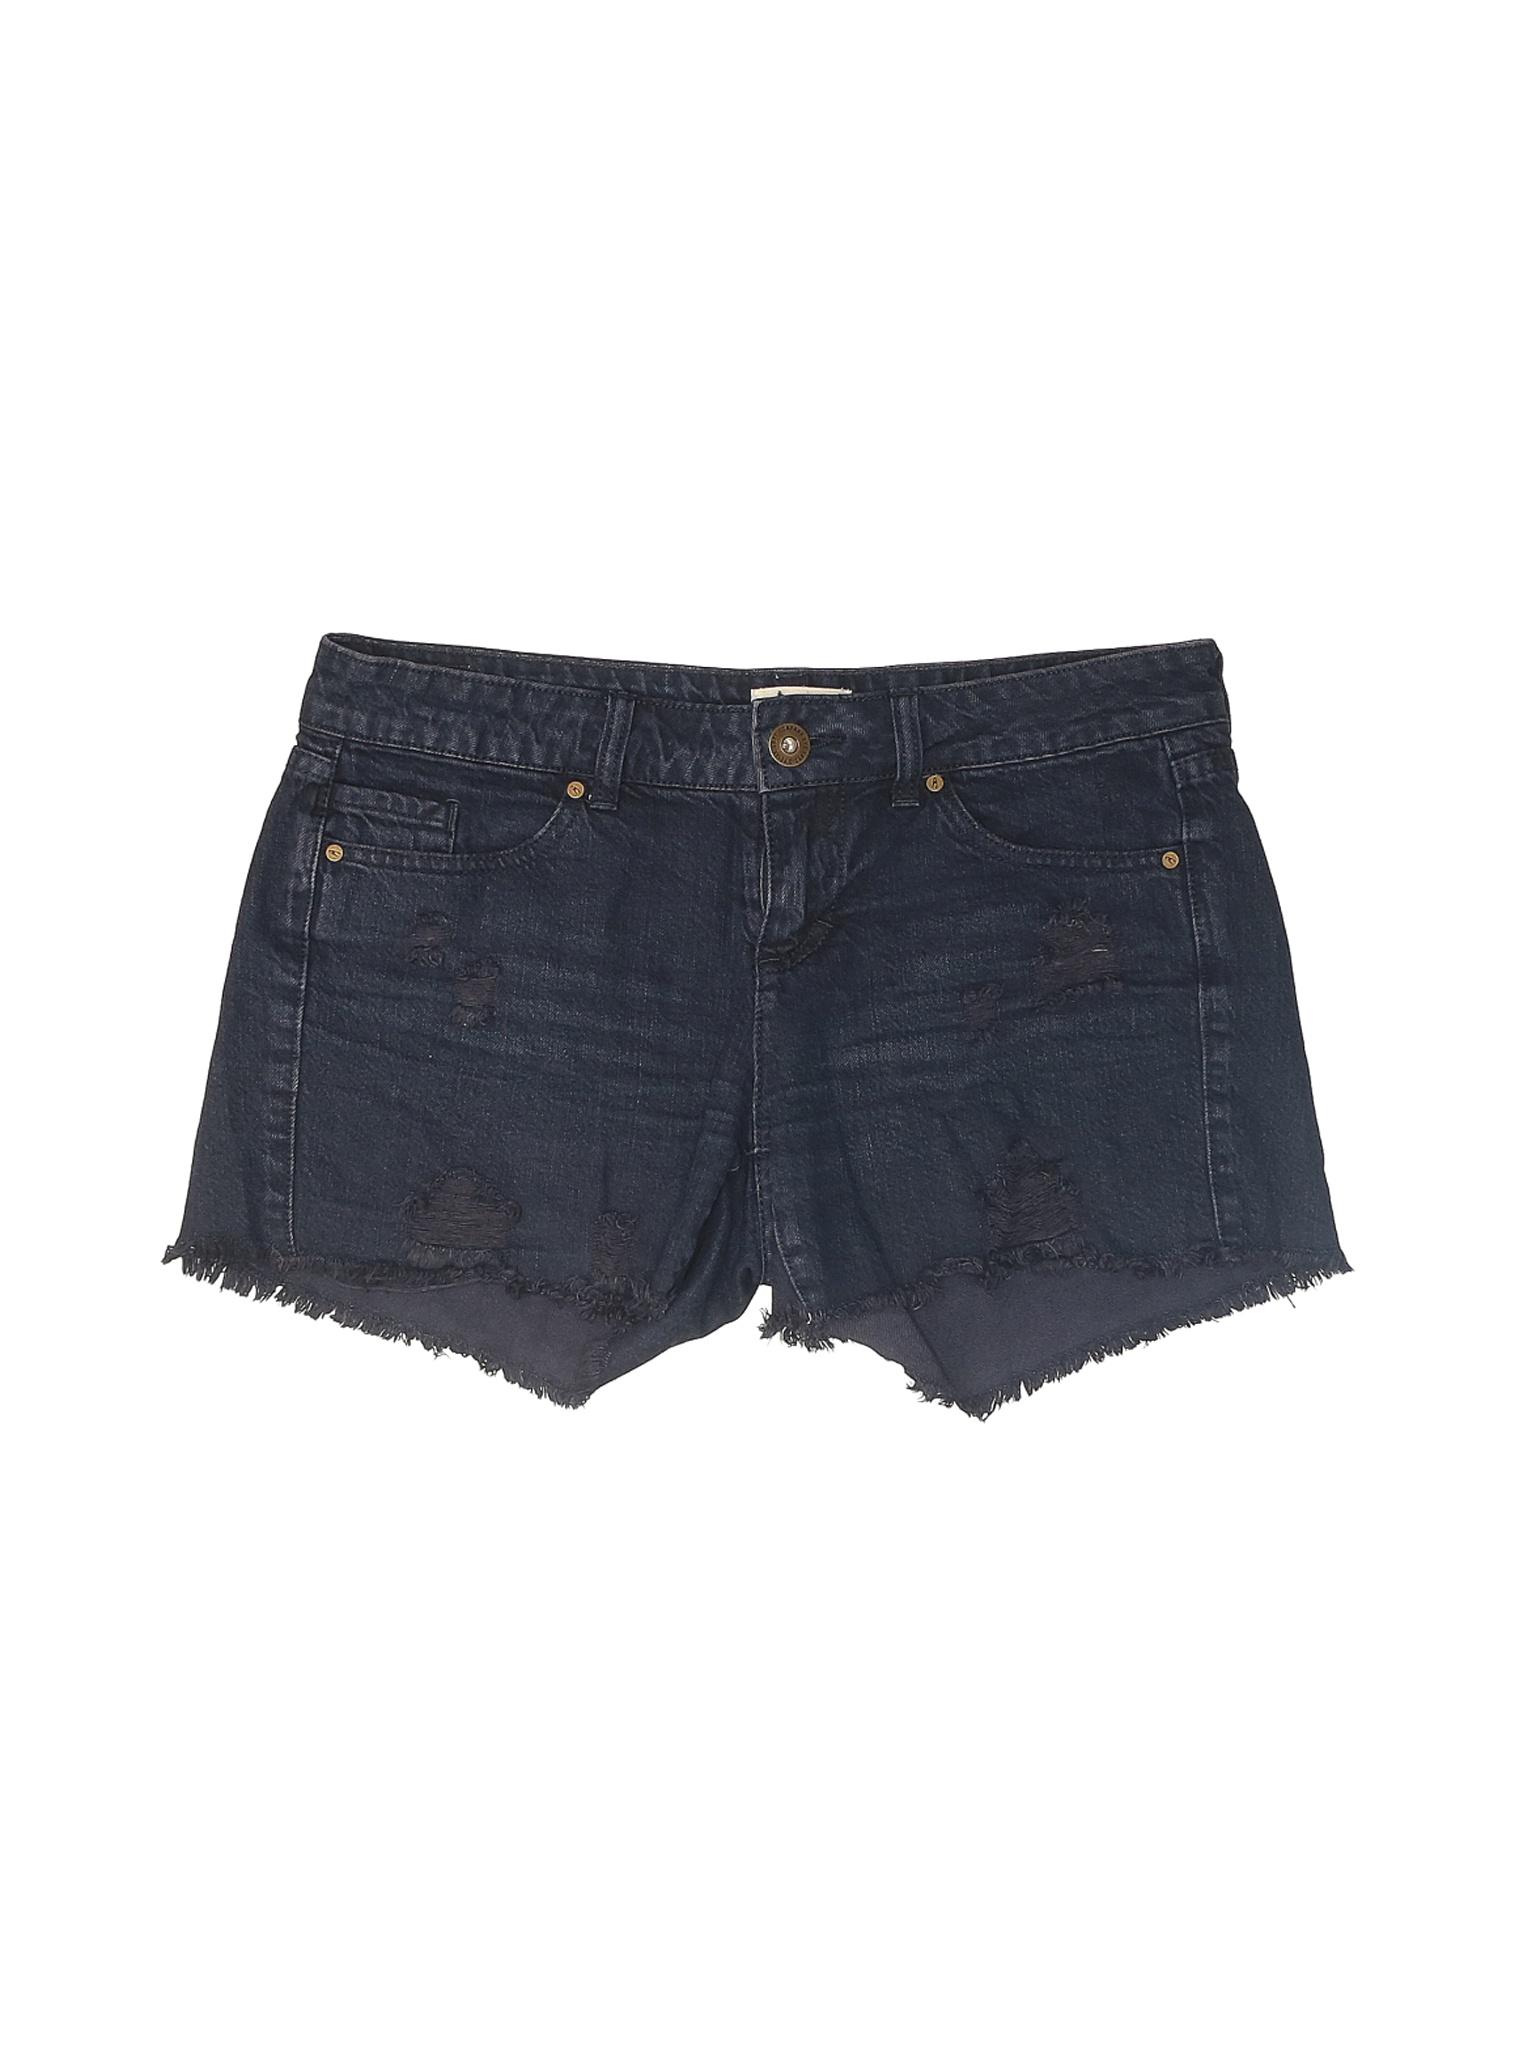 Download O'Neill Women Blue Denim Shorts 9   eBay